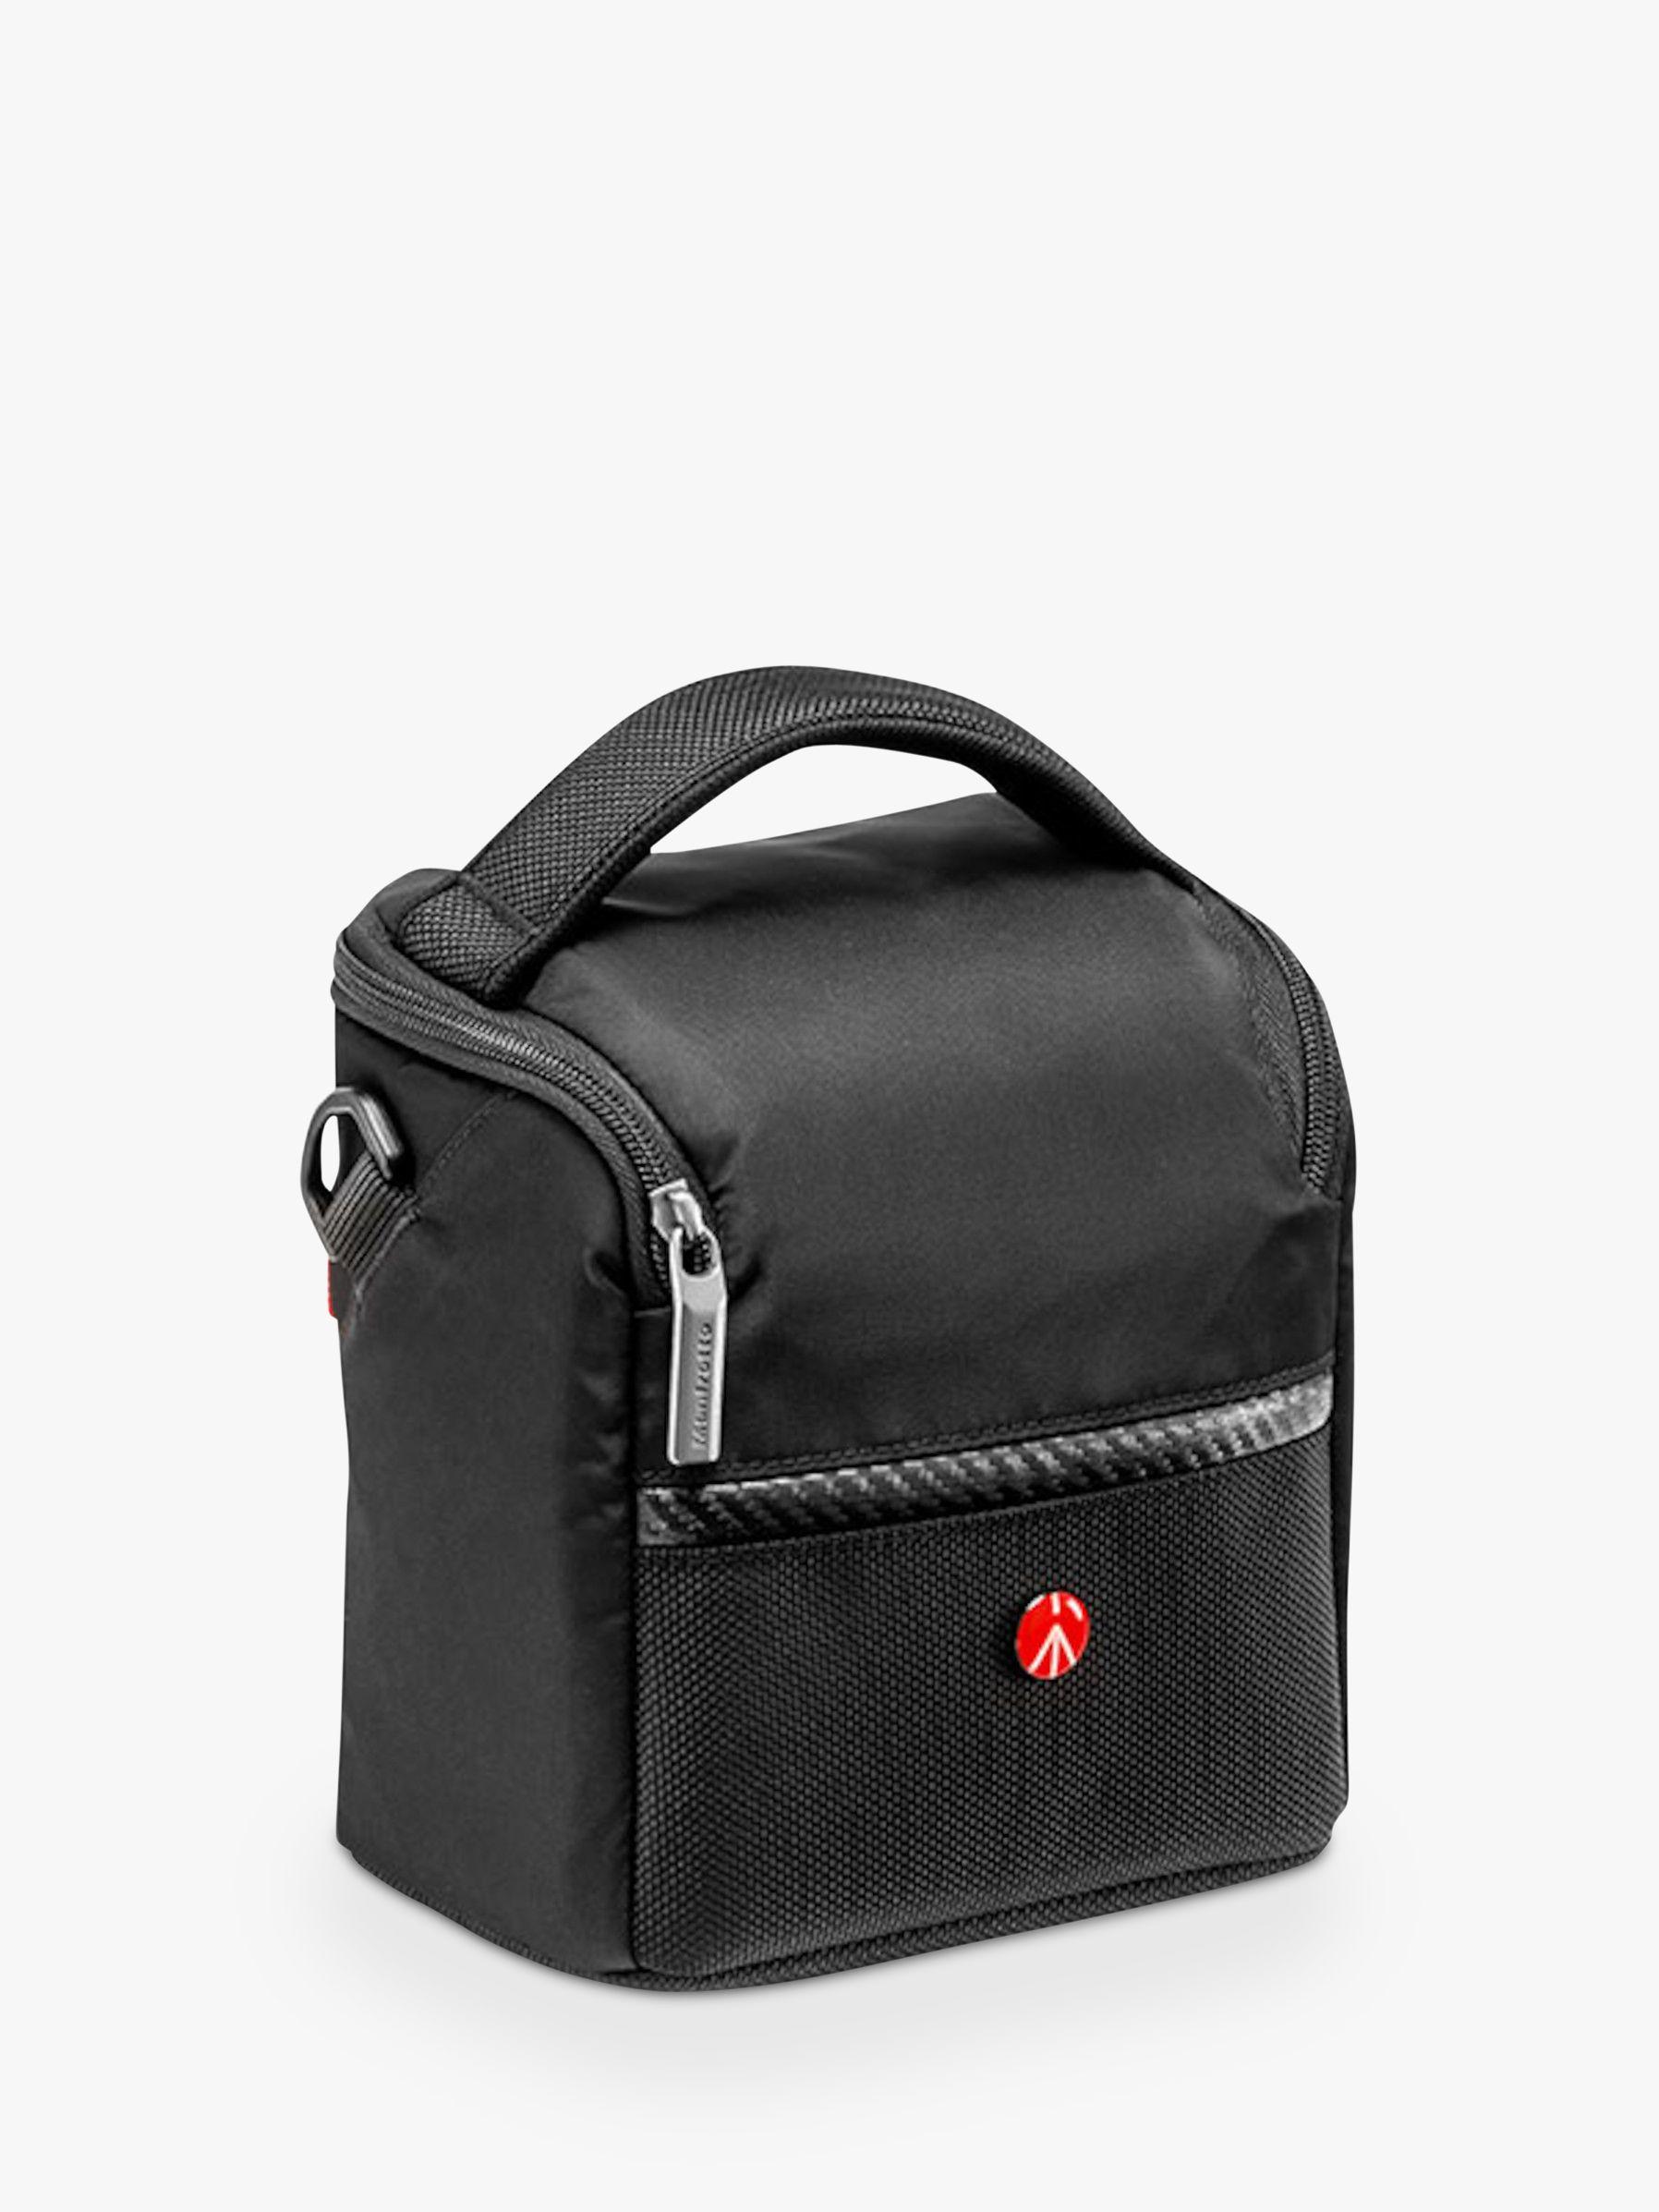 Manfrotto Manfrotto Advanced A3 Camera Shoulder Bag for CSCs, Black